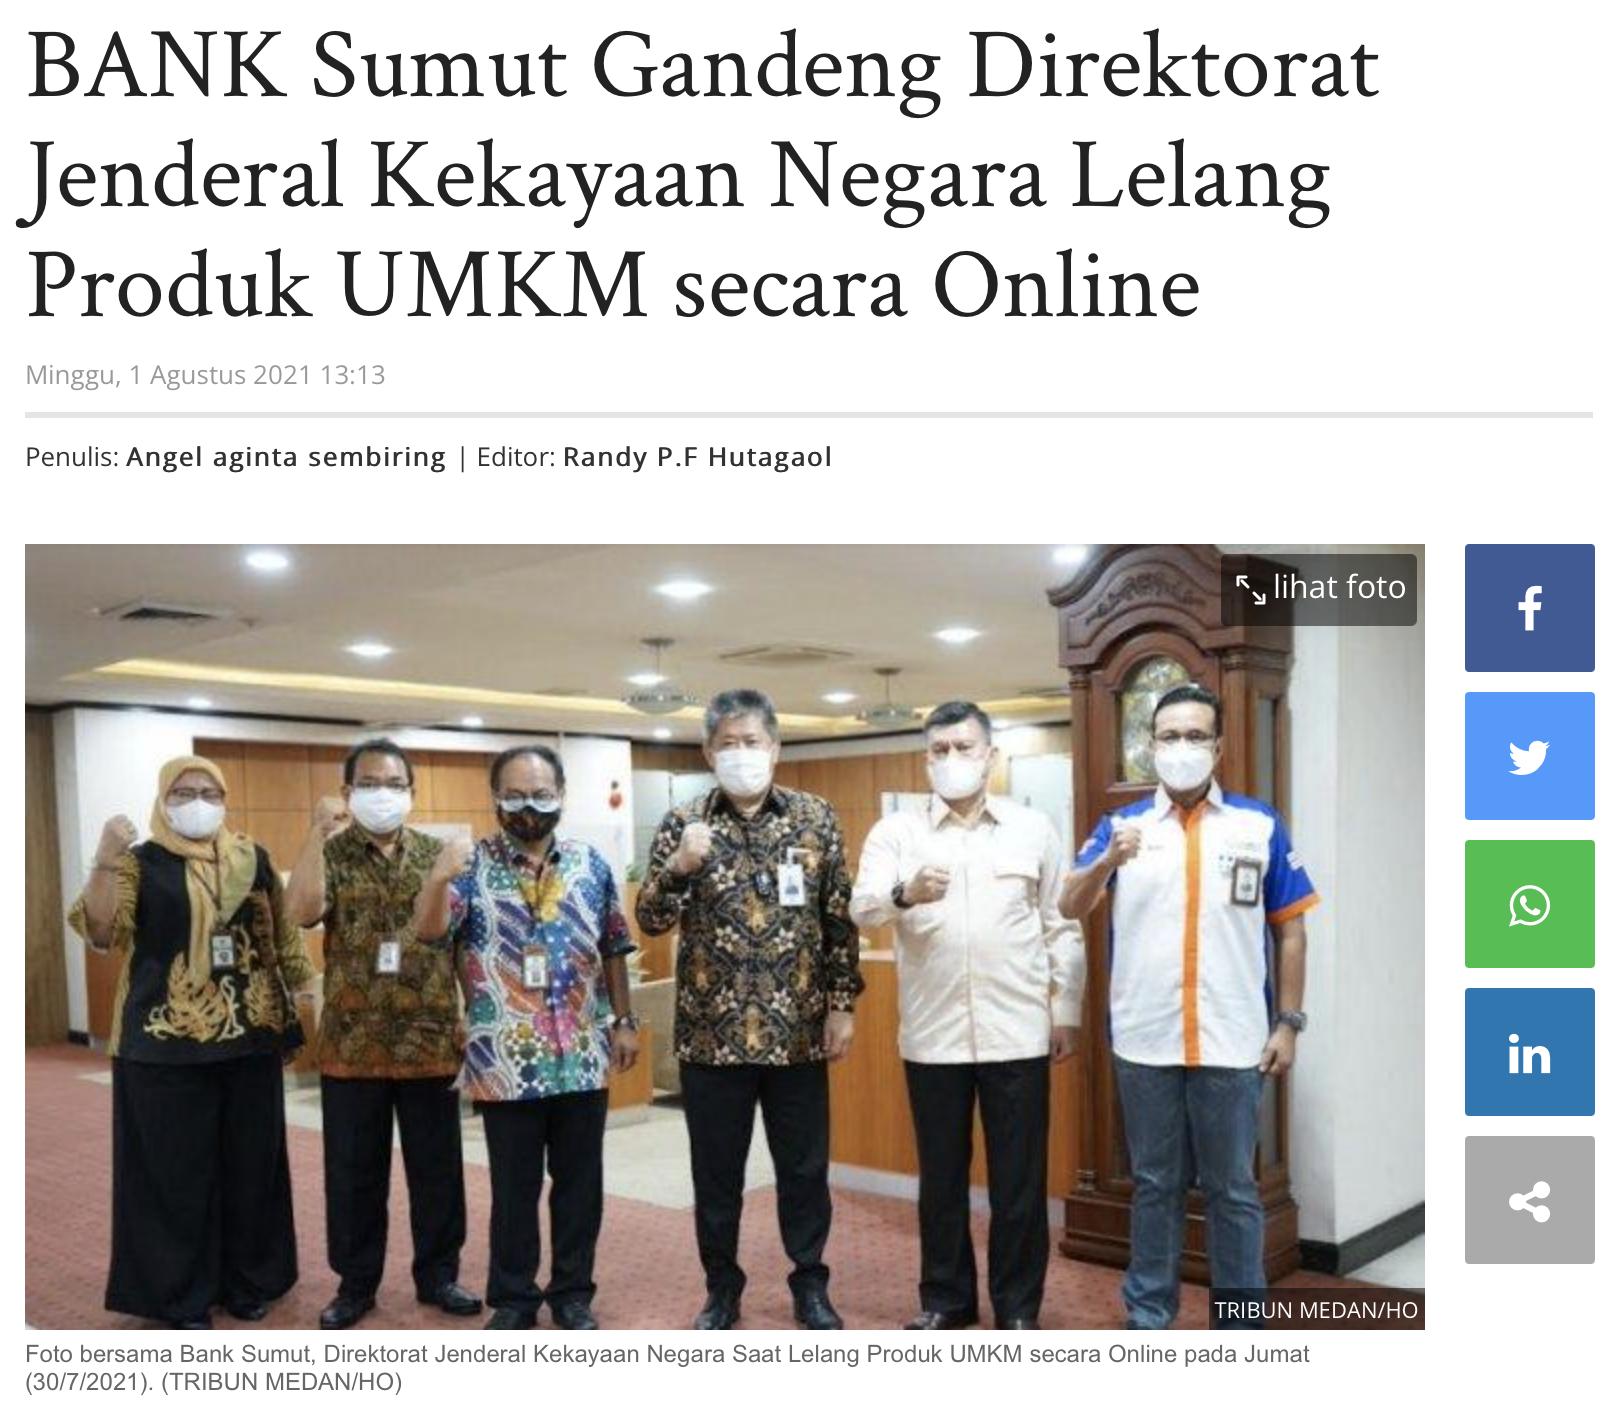 BANK Sumut Gandeng Direktorat Jenderal Kekayaan Negara Lelang Produk UMKM secara Online